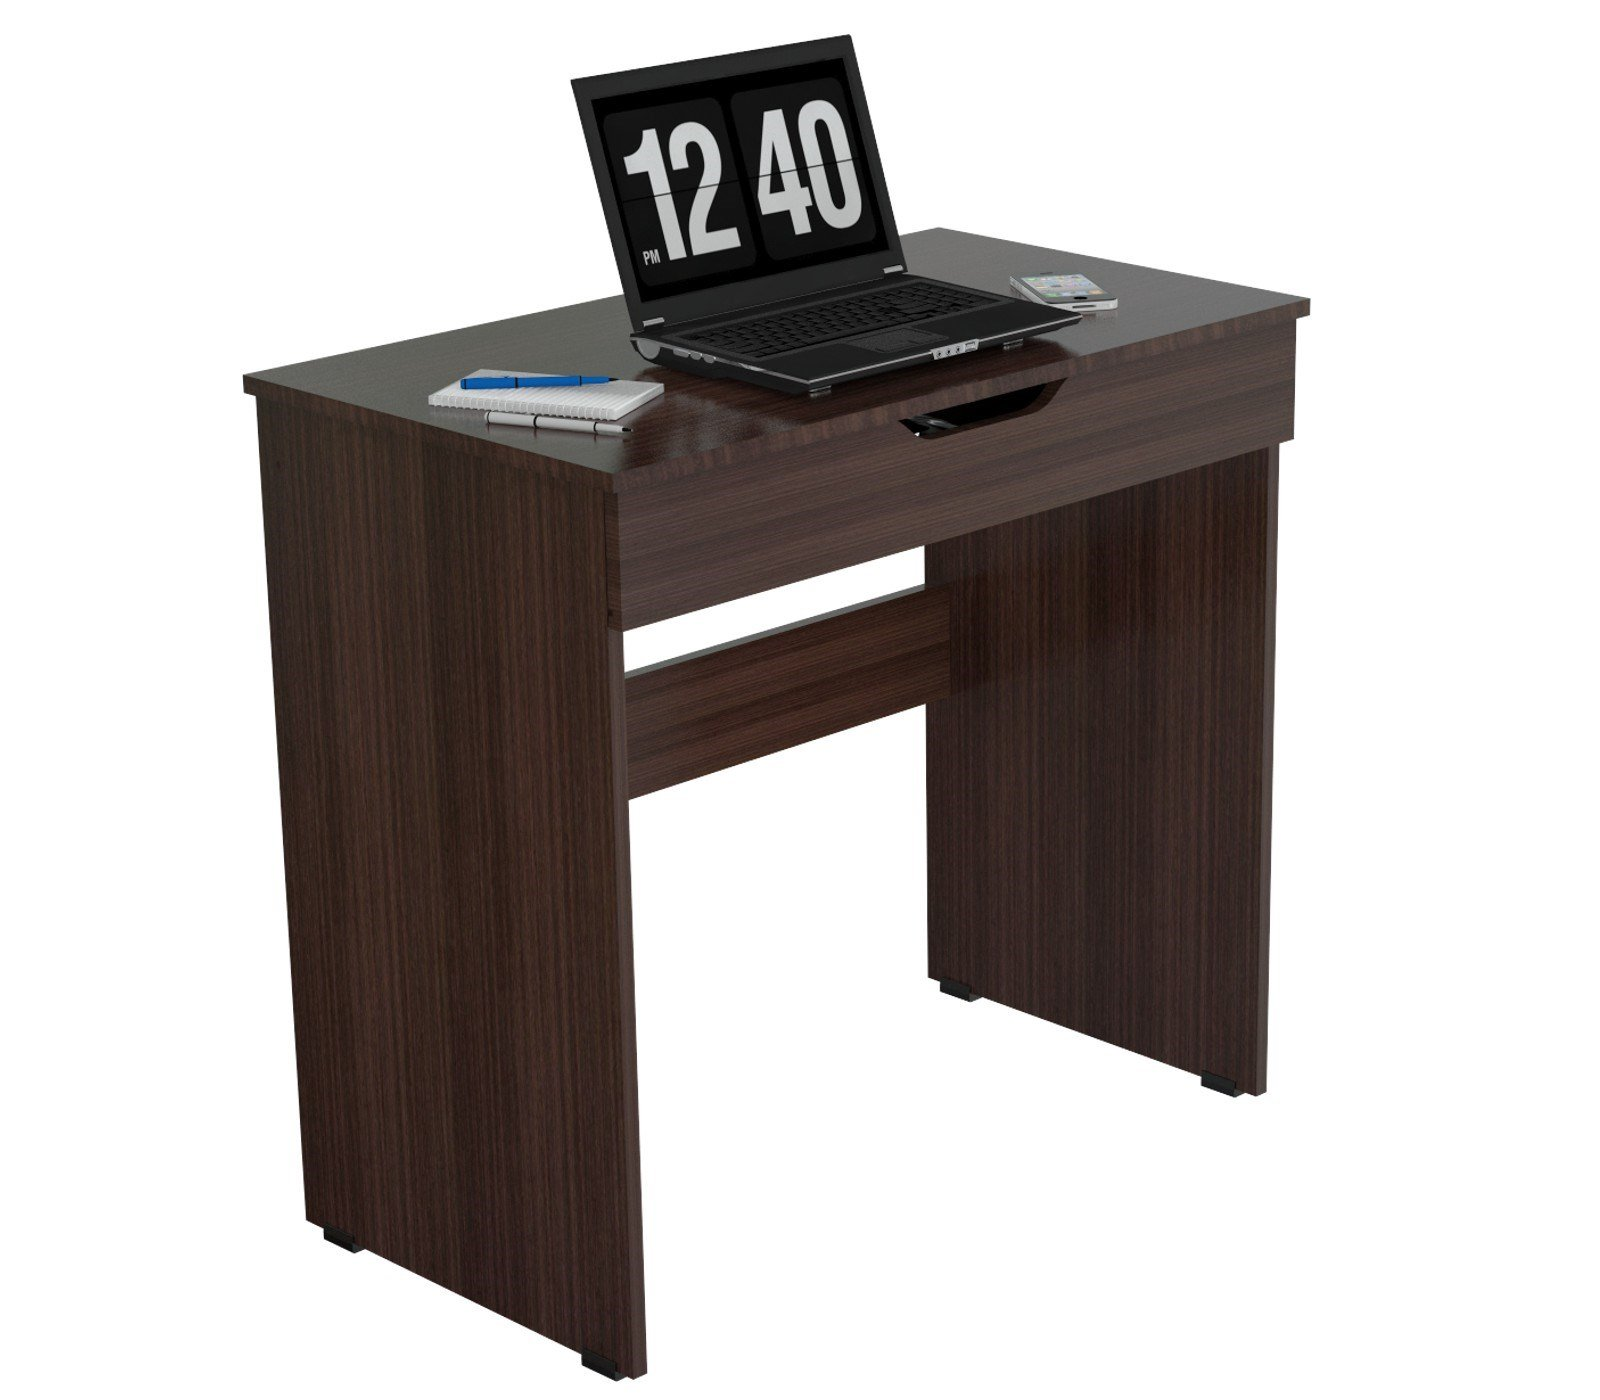 Inval ES-2803 Functional Writing Desk, Espresso-Wengue